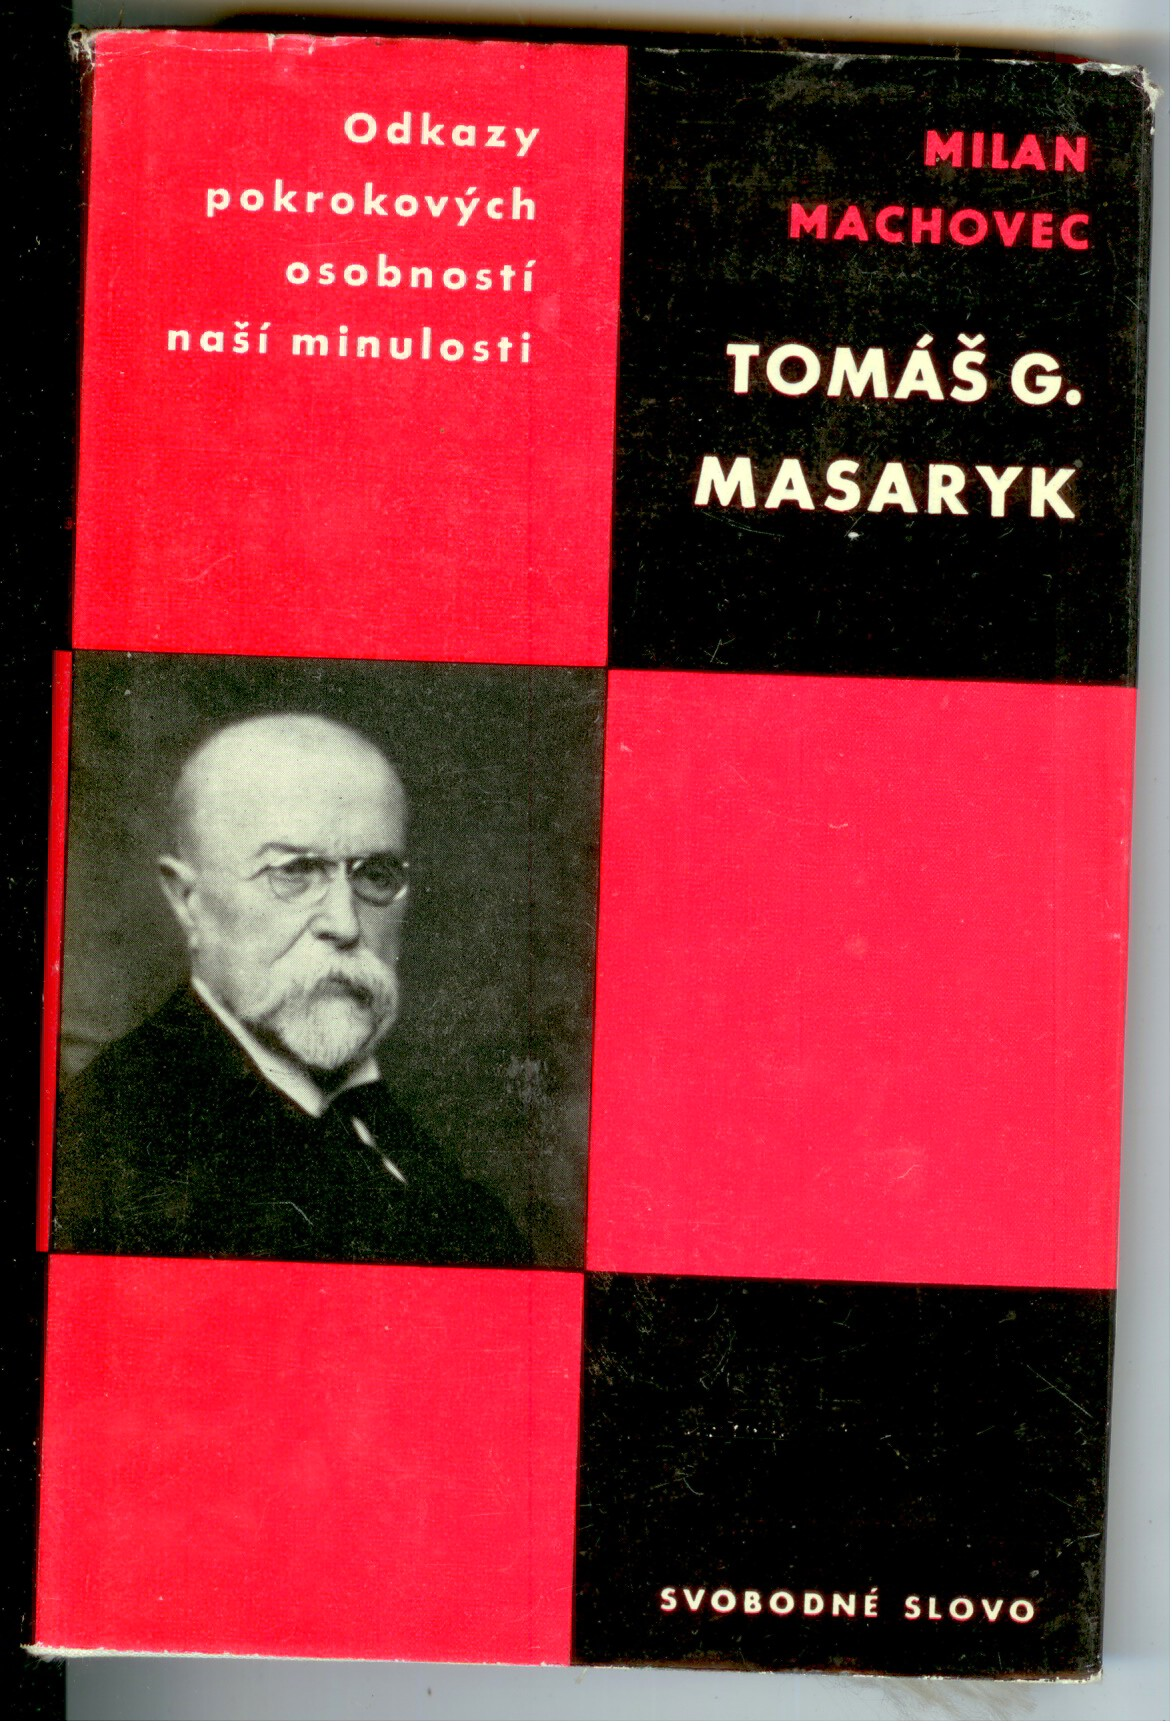 Tomáš G. Masaryk - Milan Machovec